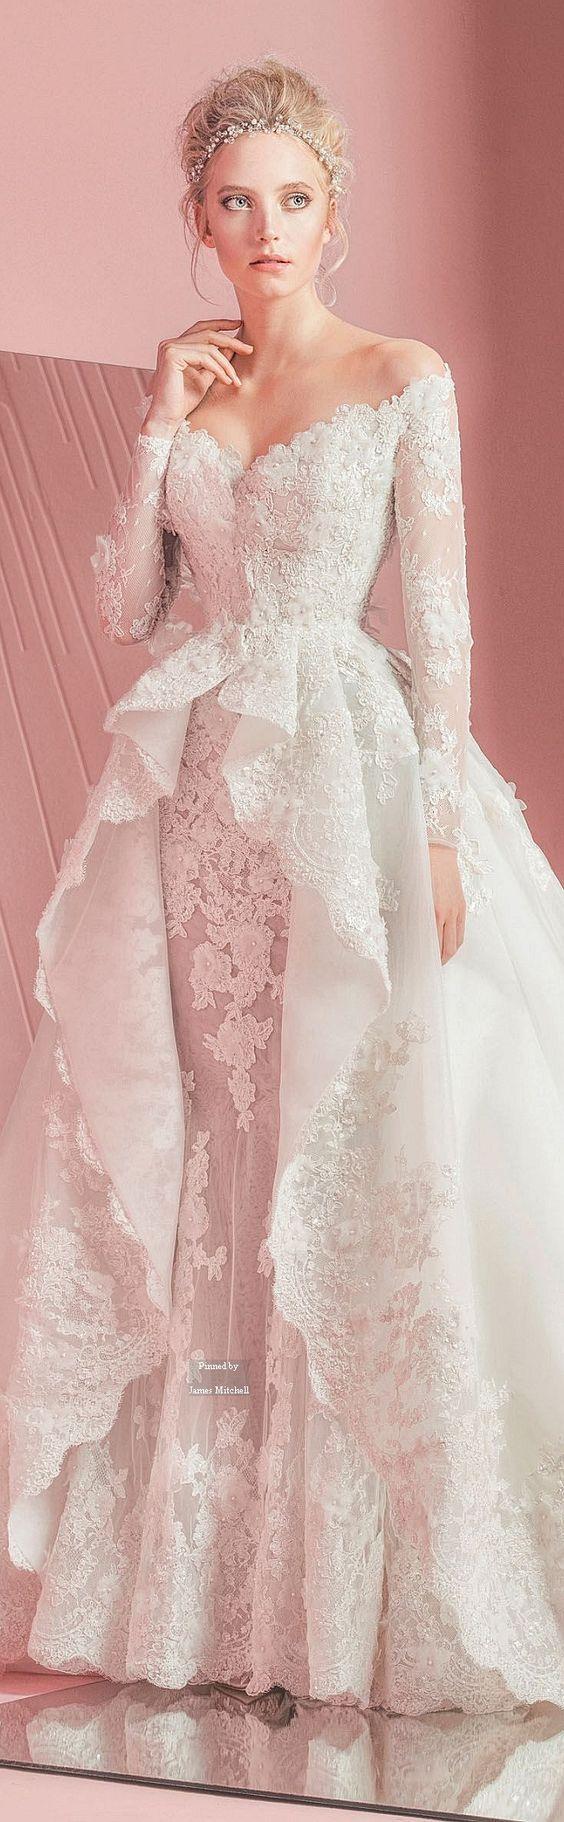 Asombroso Vestido De Novia De La Vendimia Pinterest Componente ...